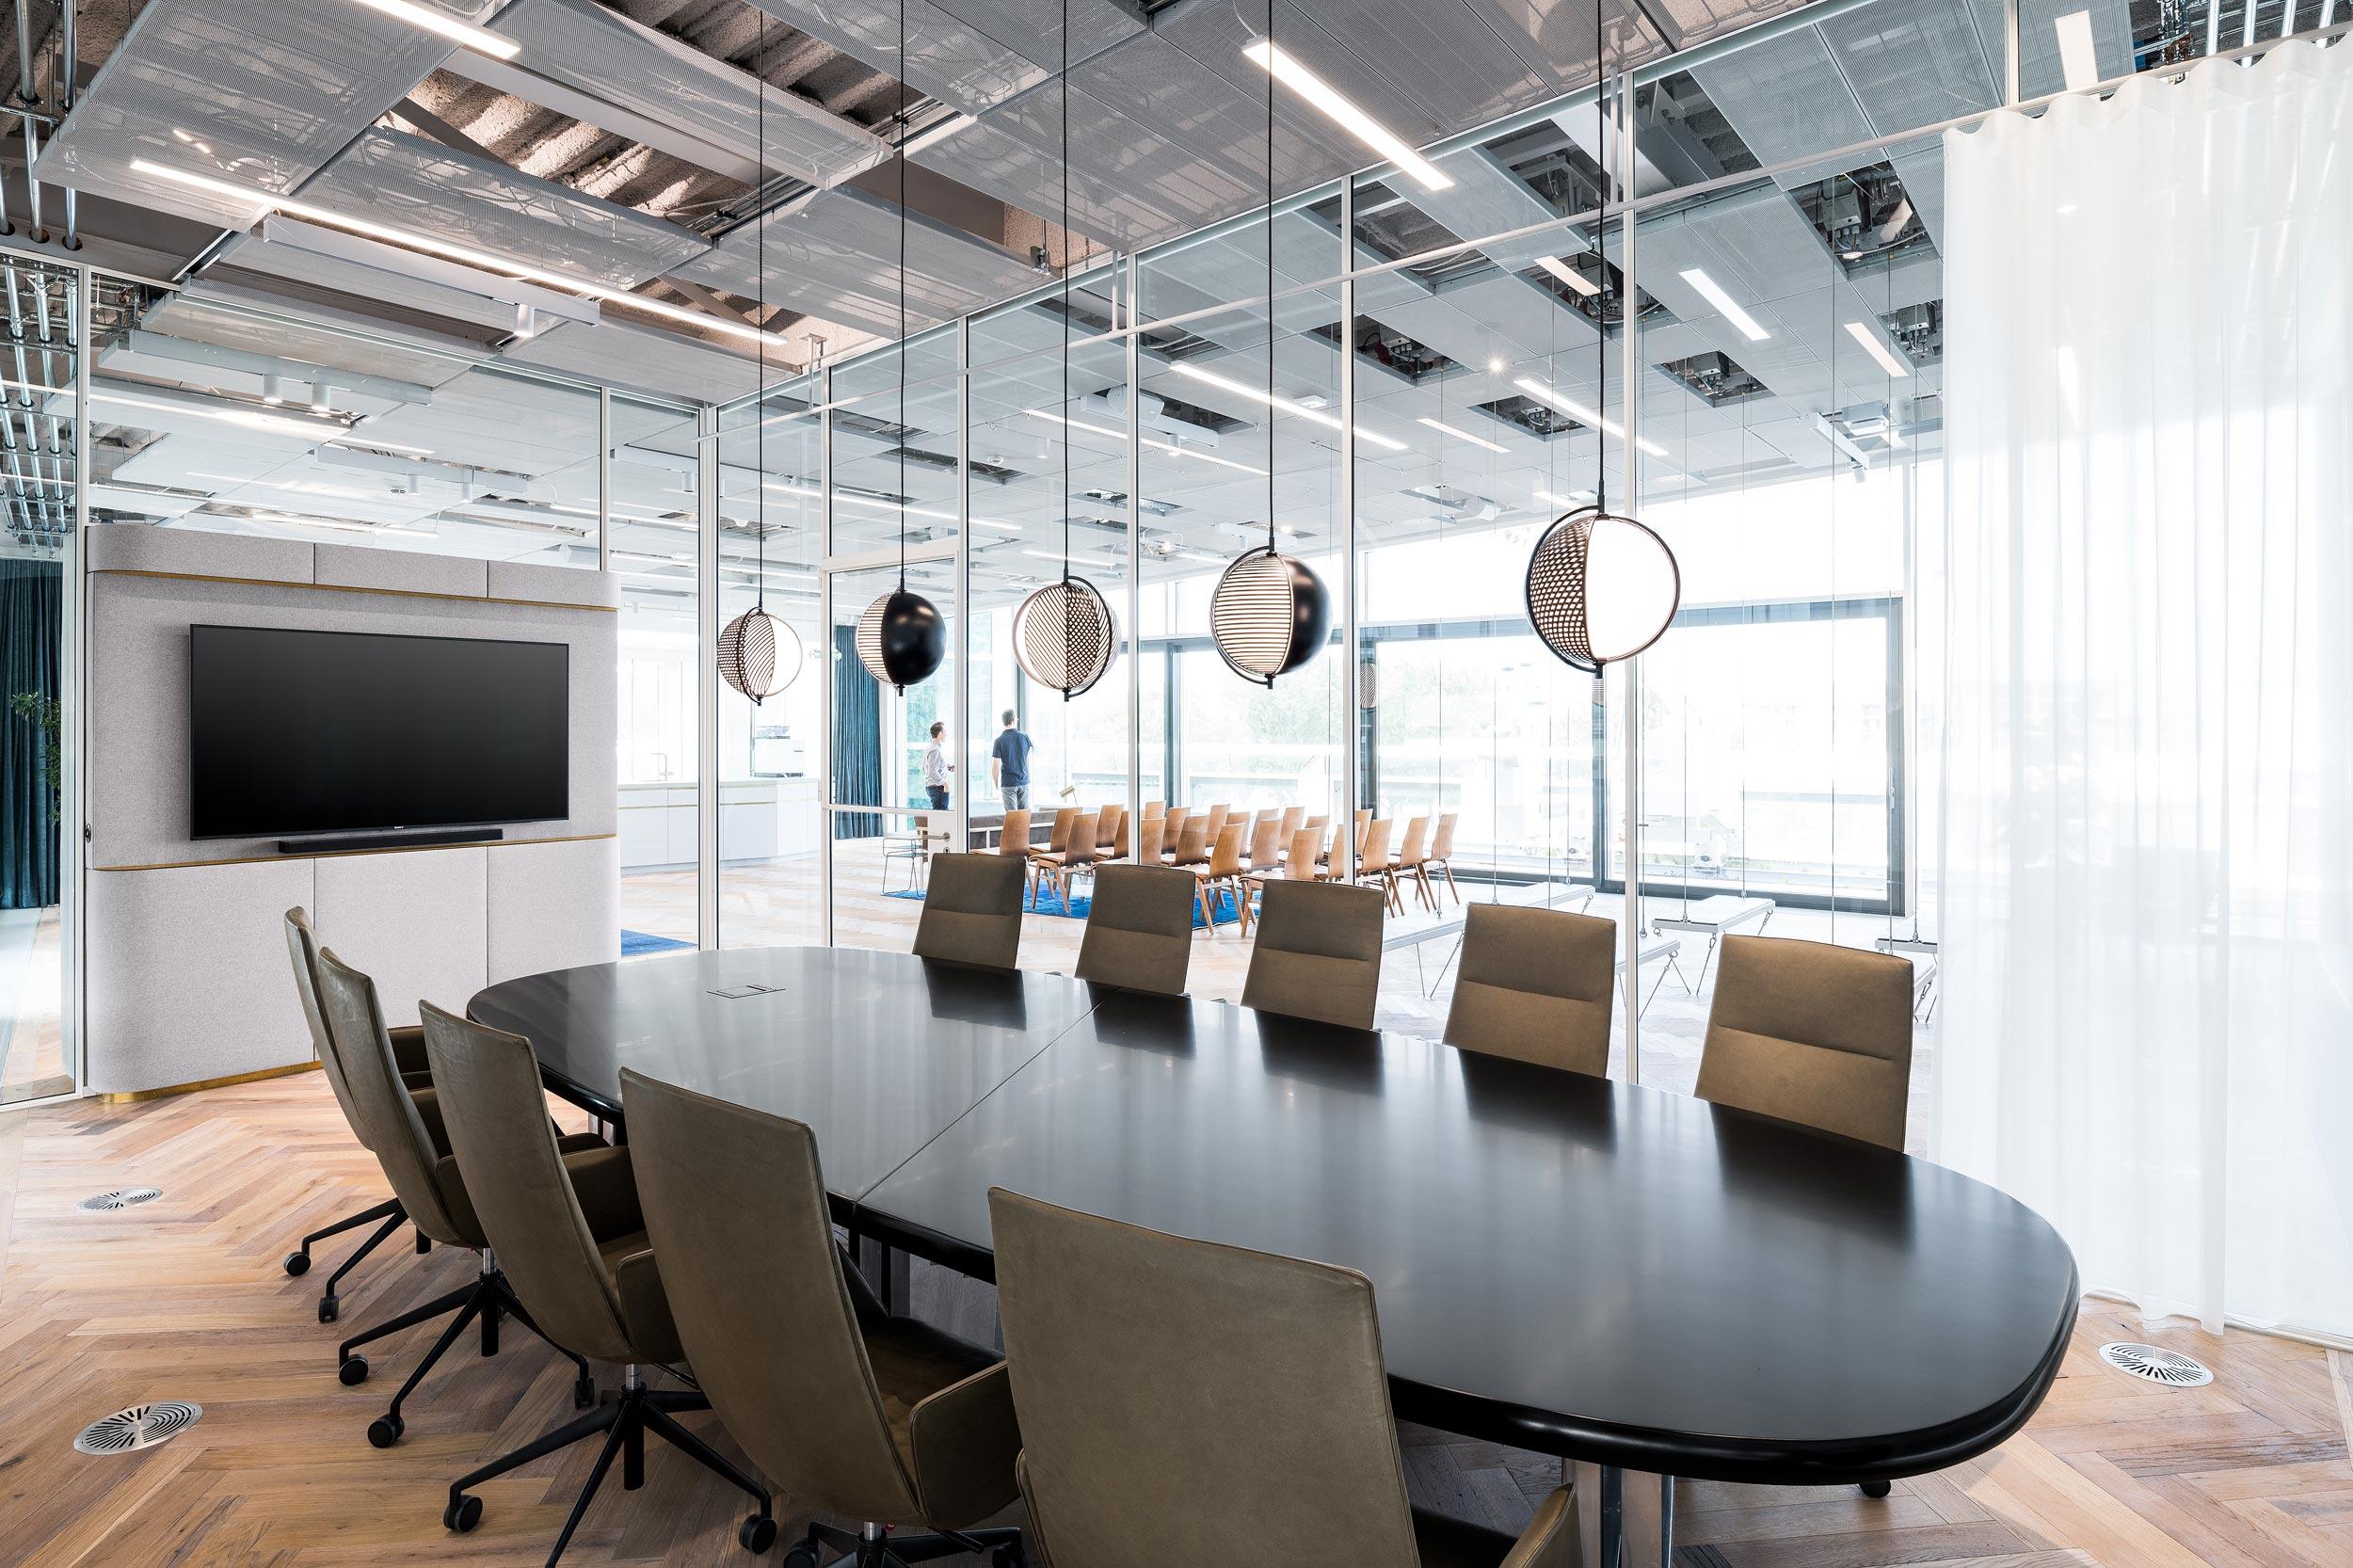 Amvest kantoor Amsterdam - interieurfotograaf Chiel de Nooyer